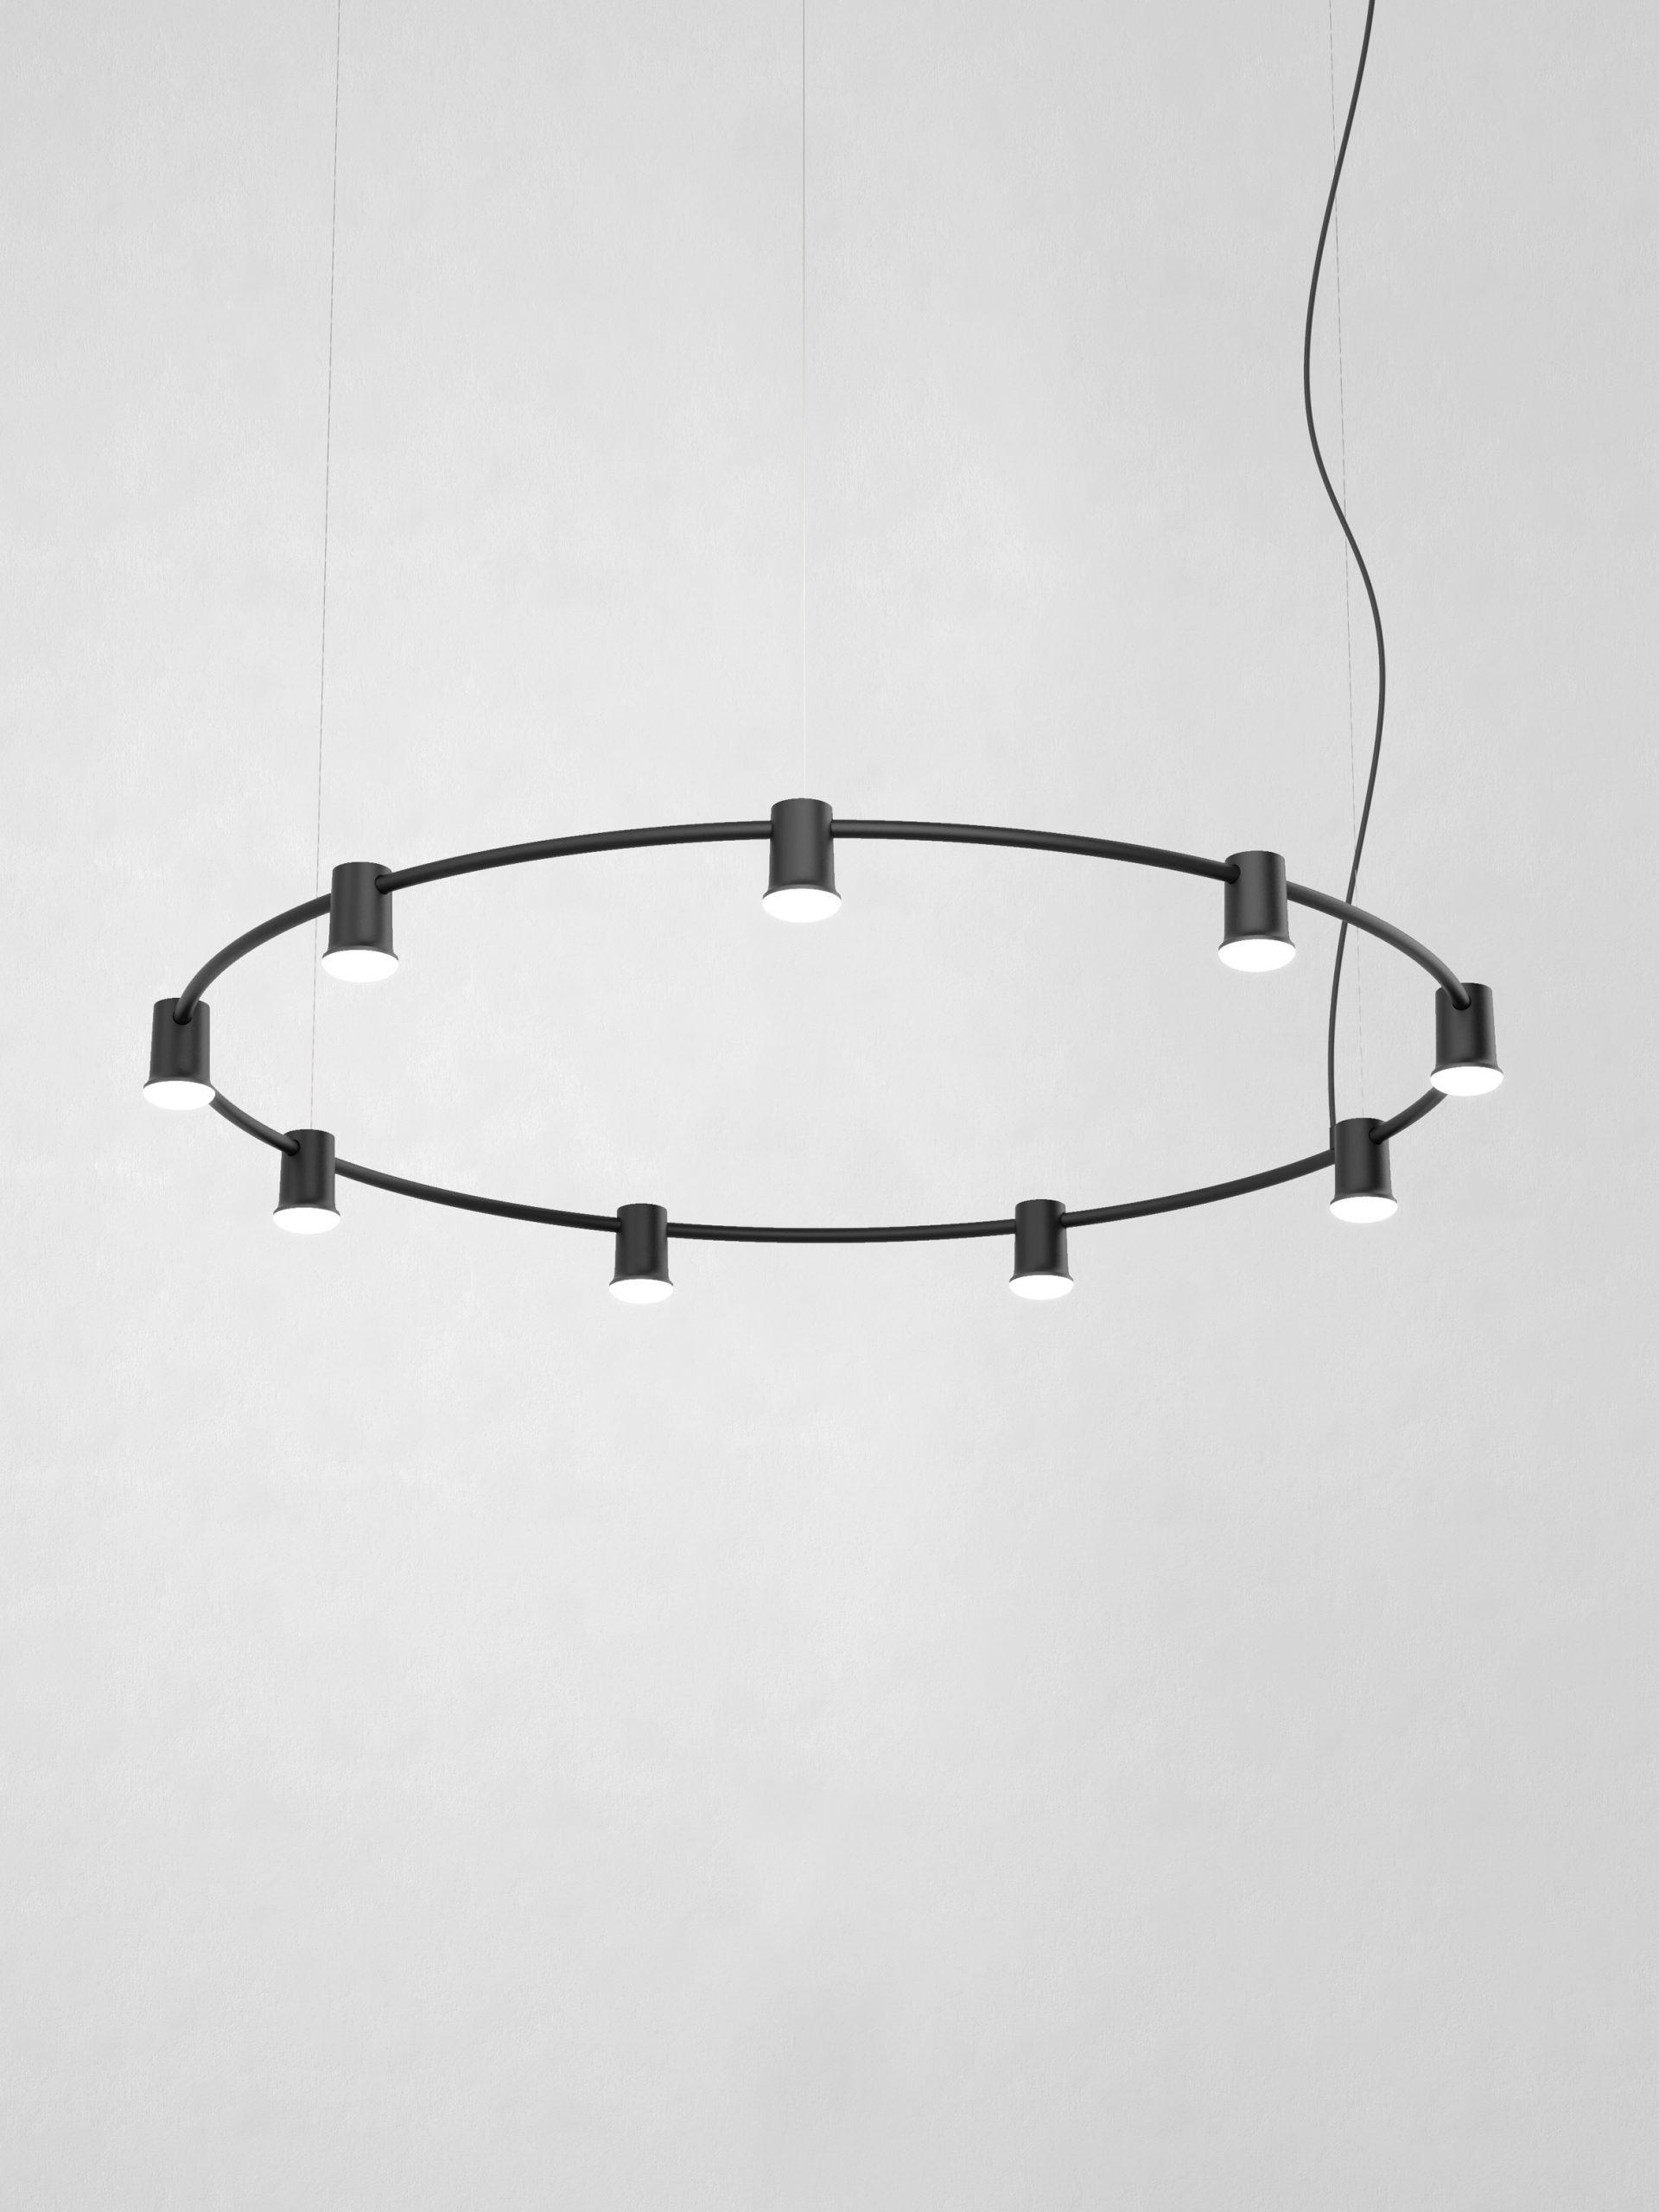 Jens Fager's Compose Rail for Zero Lighting in black